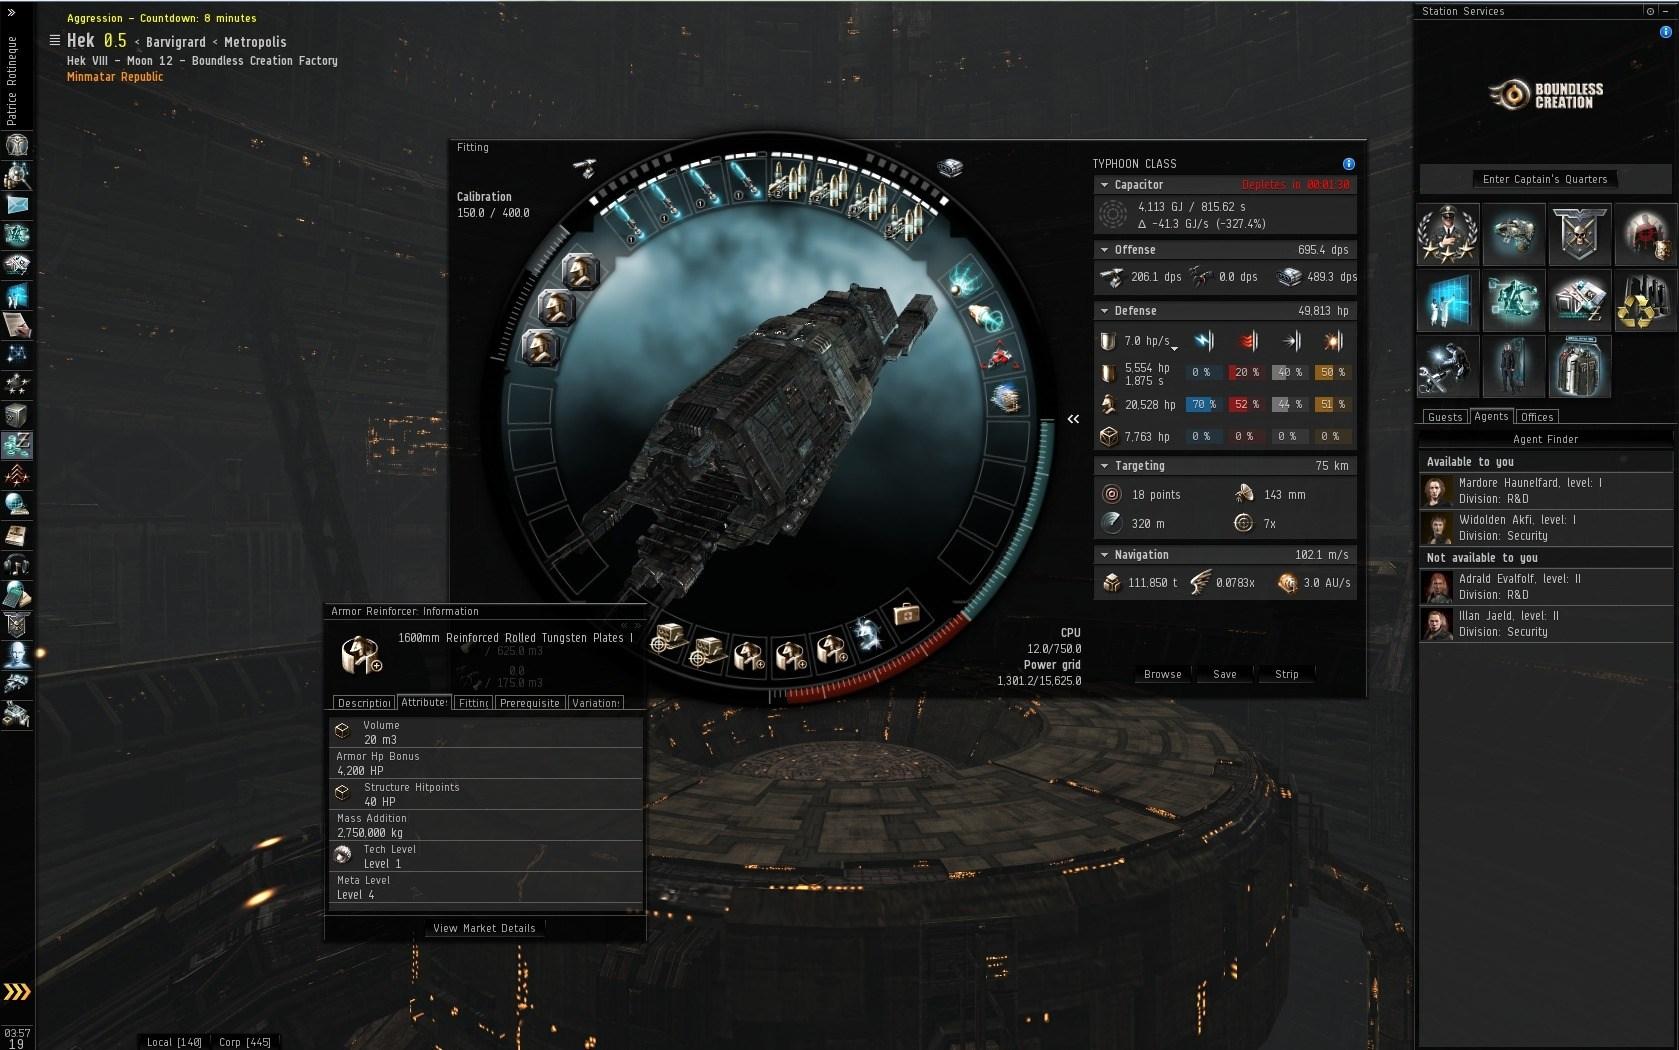 Kurioser Betrug: Lobbyist sorgt für Korruptionsskandal in Eve Online